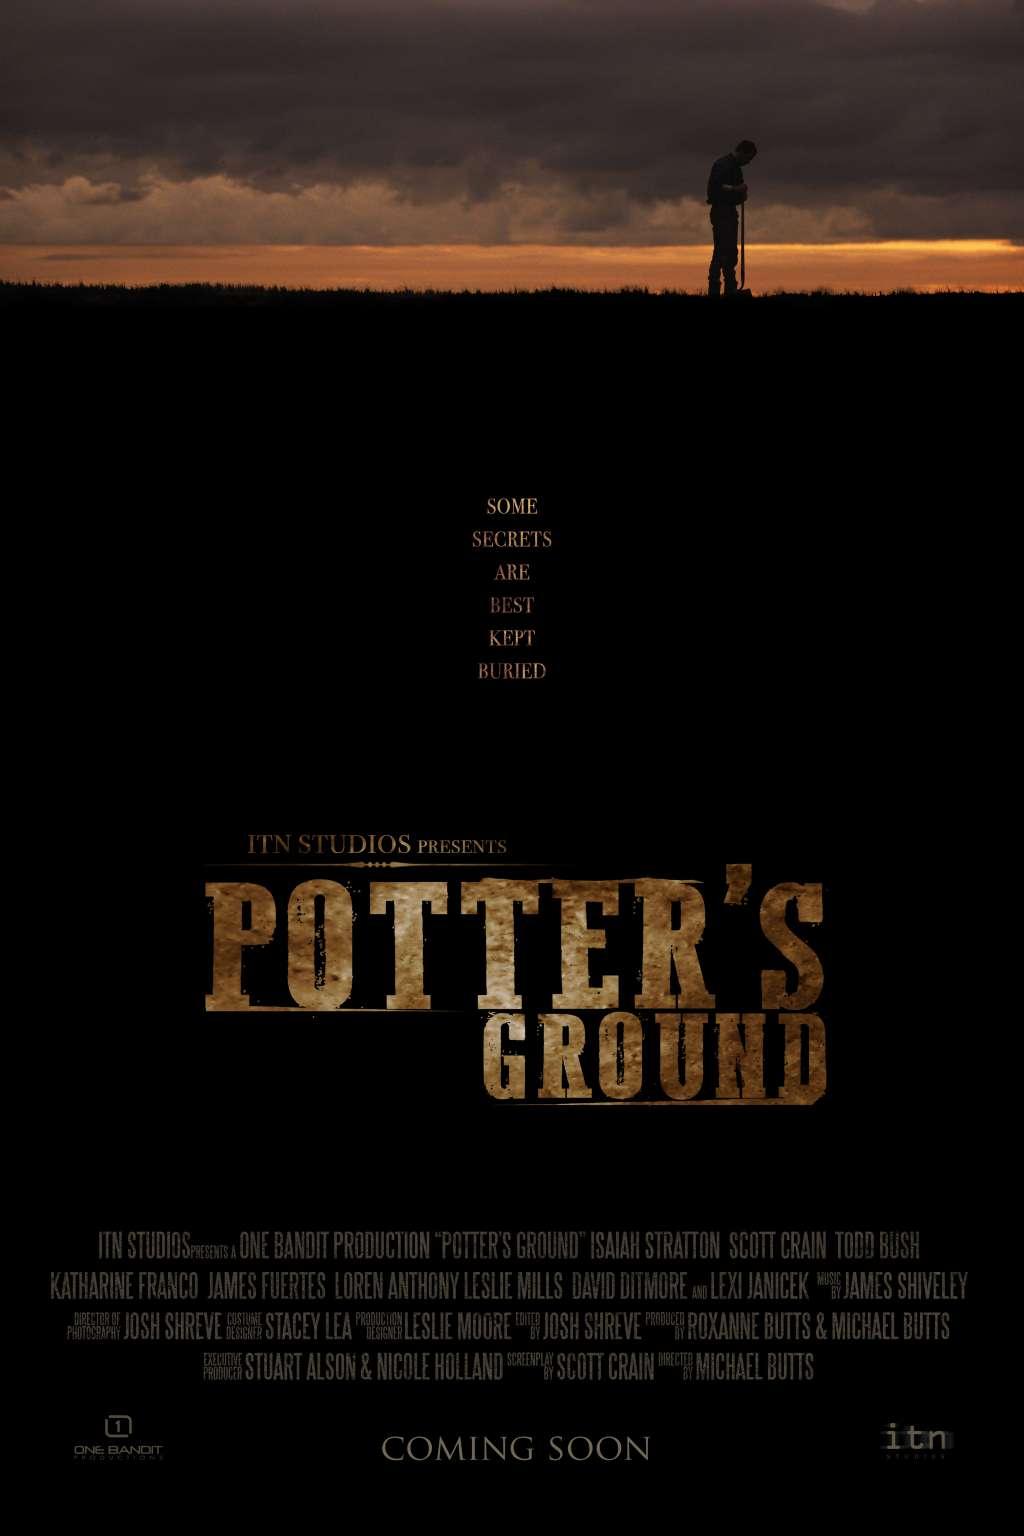 Potter's Ground kapak